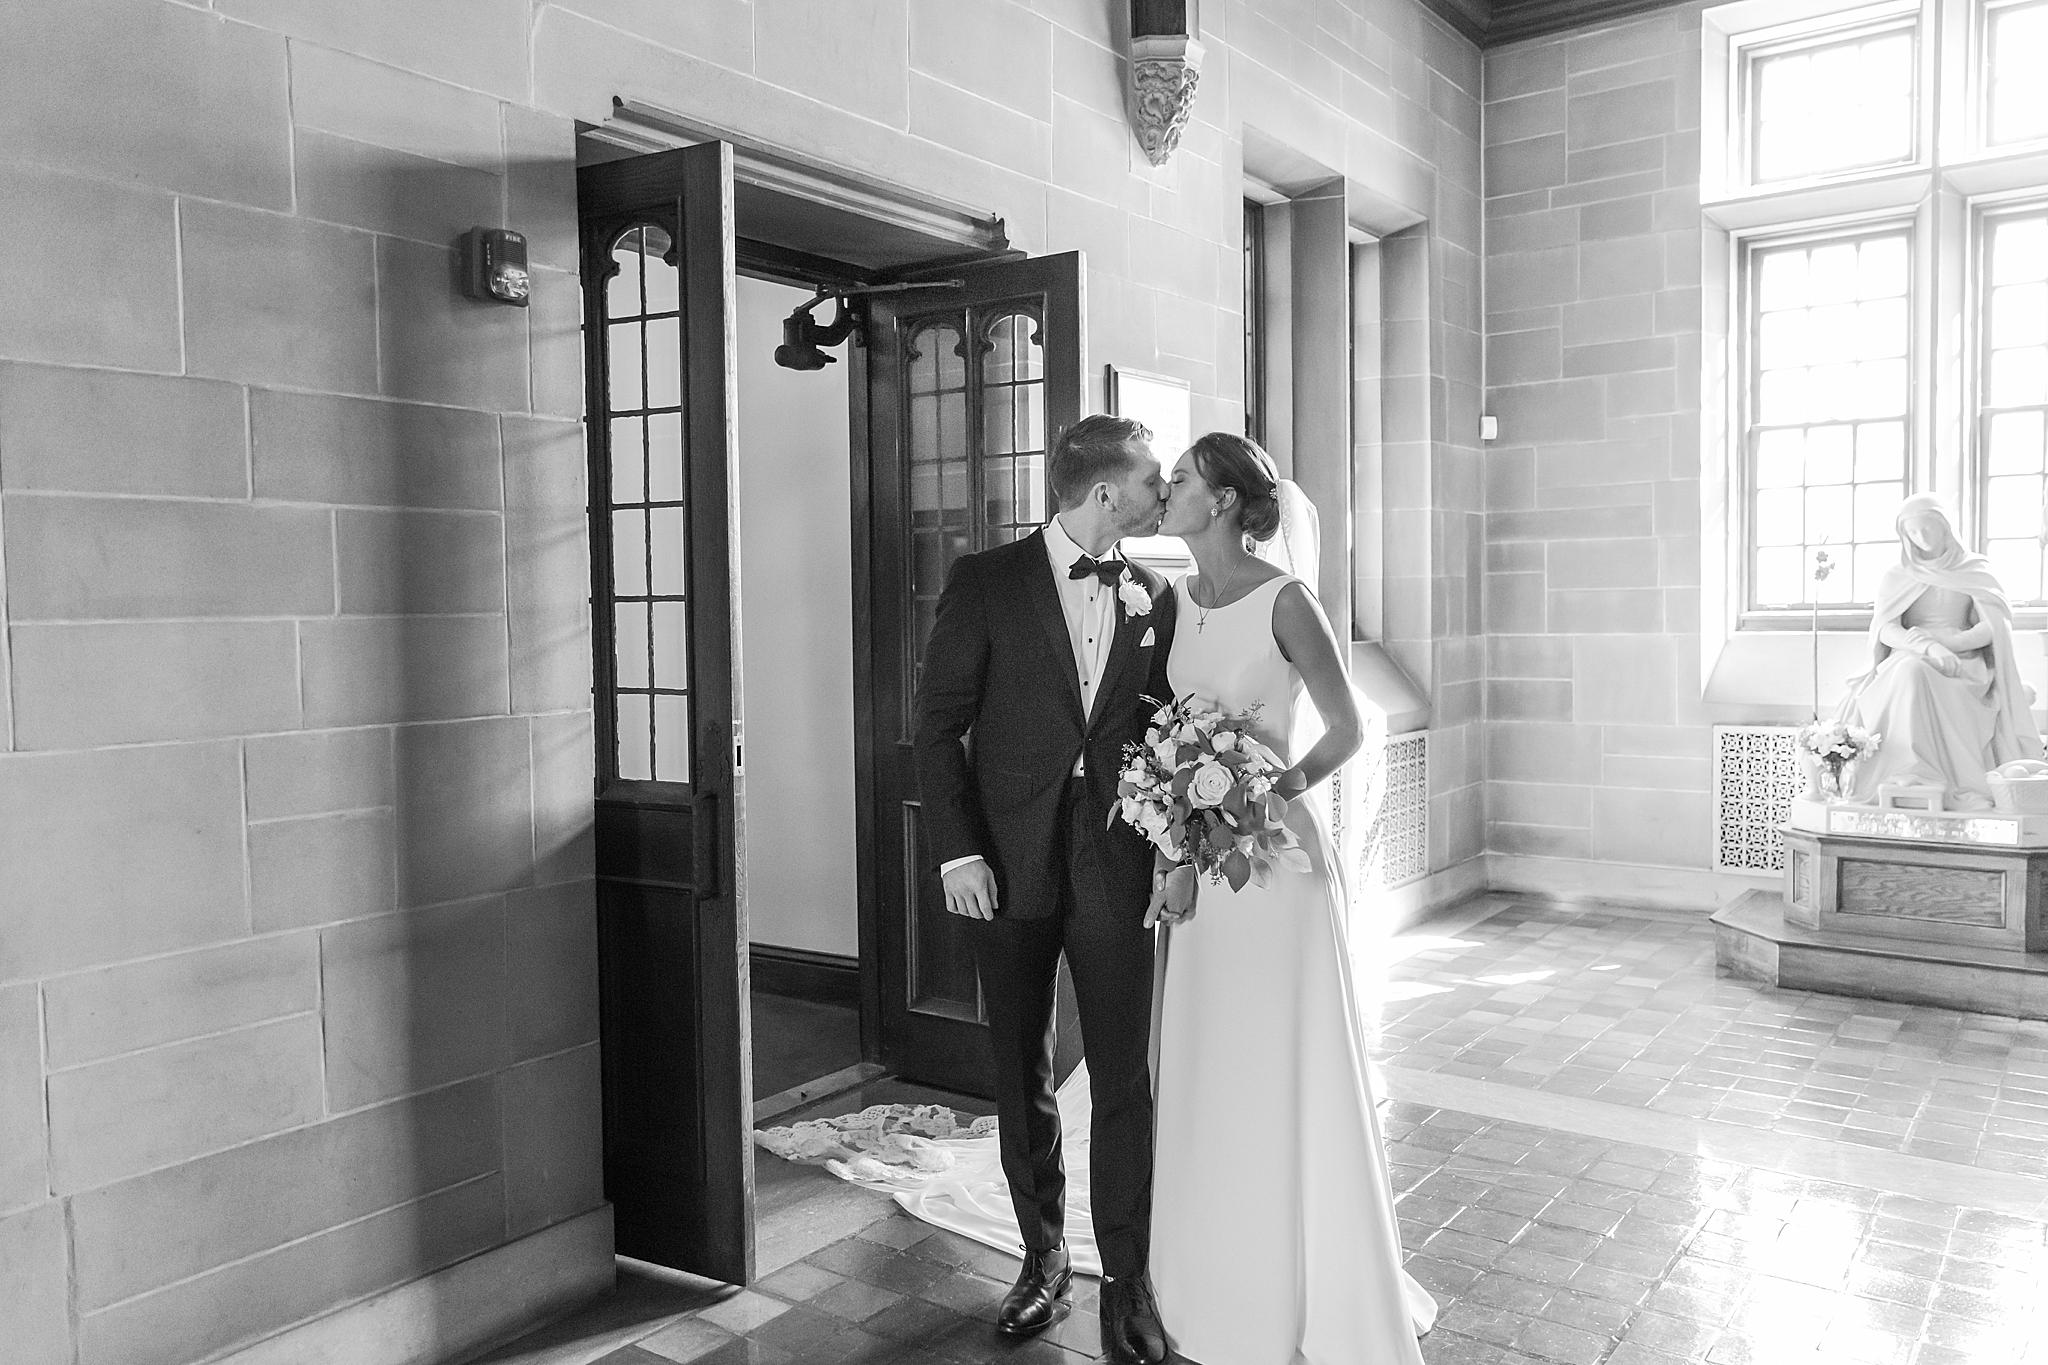 detroit-wedding-photographer-grosse-pointe-academy-chapel-detroit-golf-club-wedding-carly-matt-by-courtney-carolyn-photography_0053.jpg